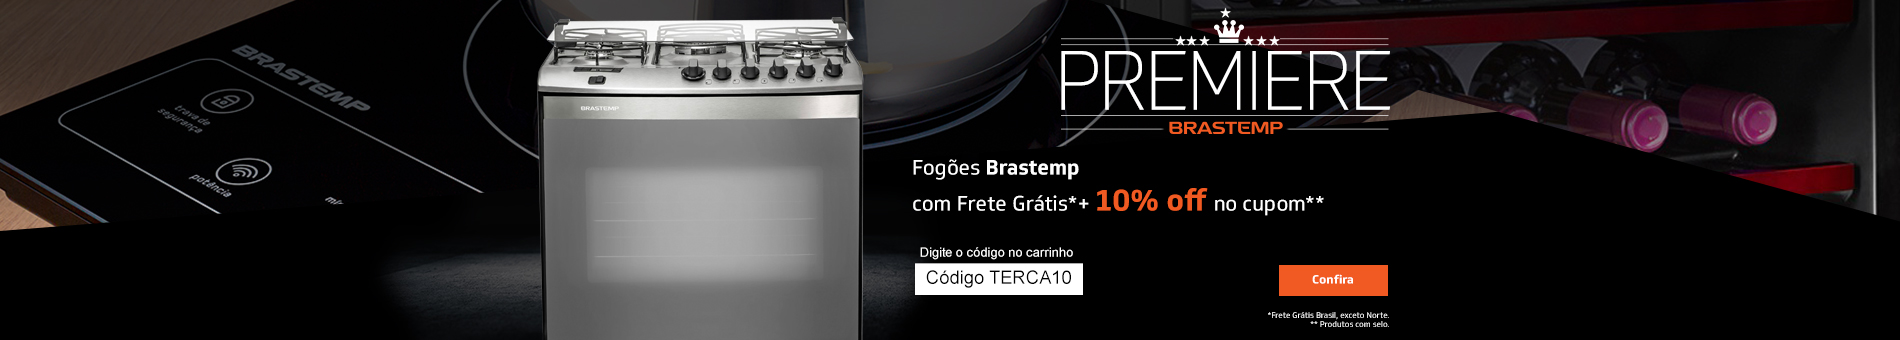 Promoção Interna - 780 - premierbrastemp_fogoes_home3_29082016 - fogoes - 3